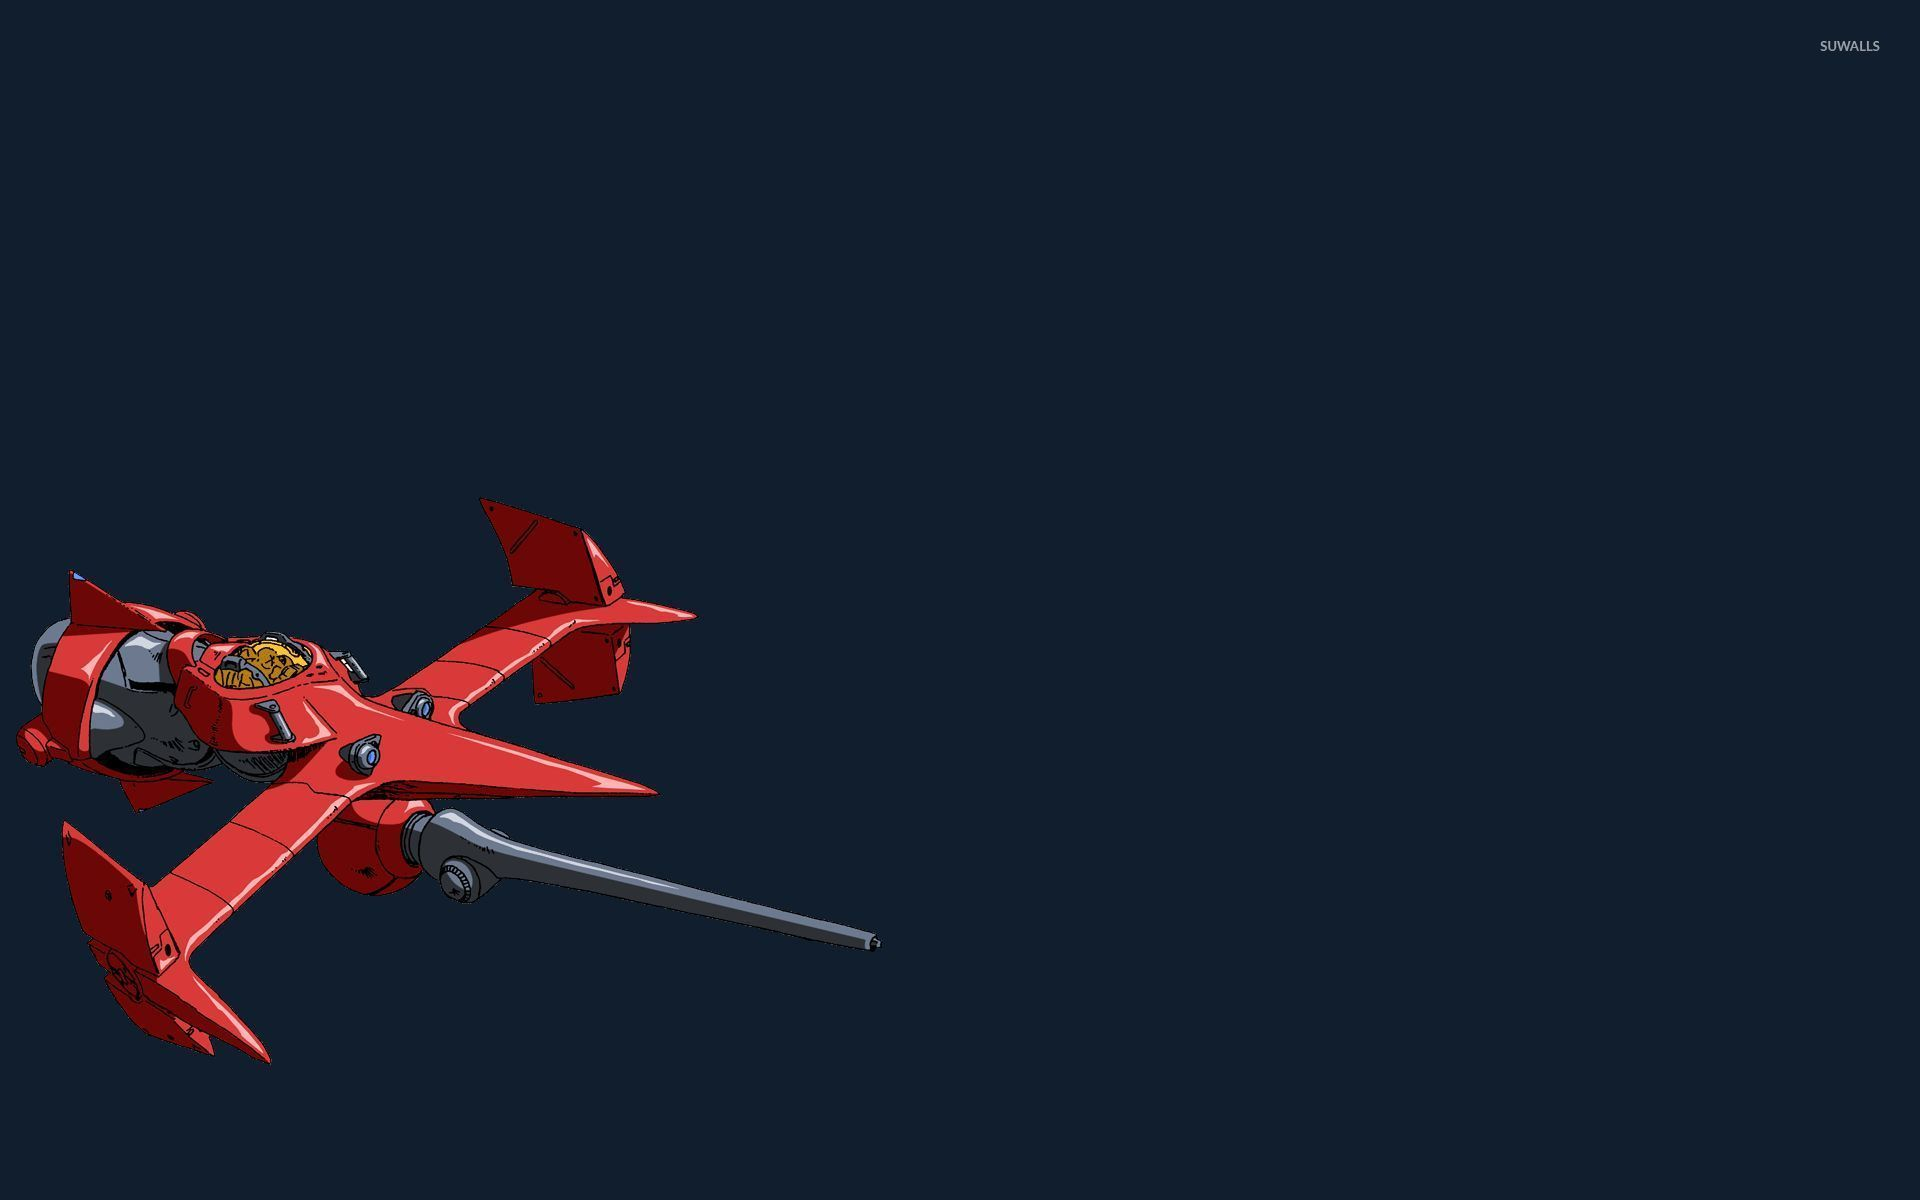 Cowboy Bebop Swordfish Wallpapers Top Free Cowboy Bebop Swordfish